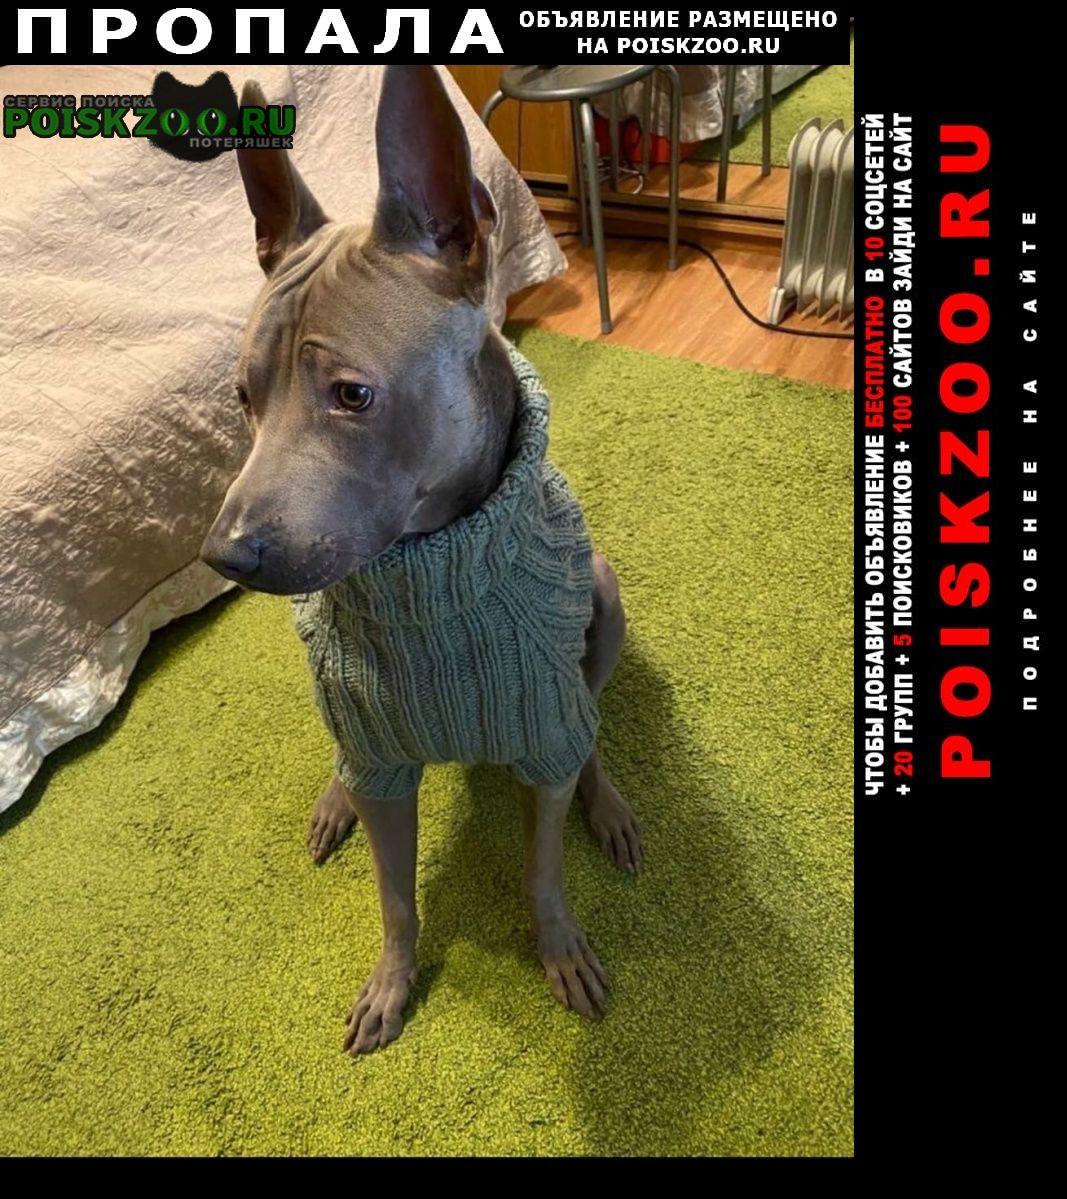 Москва Пропала собака